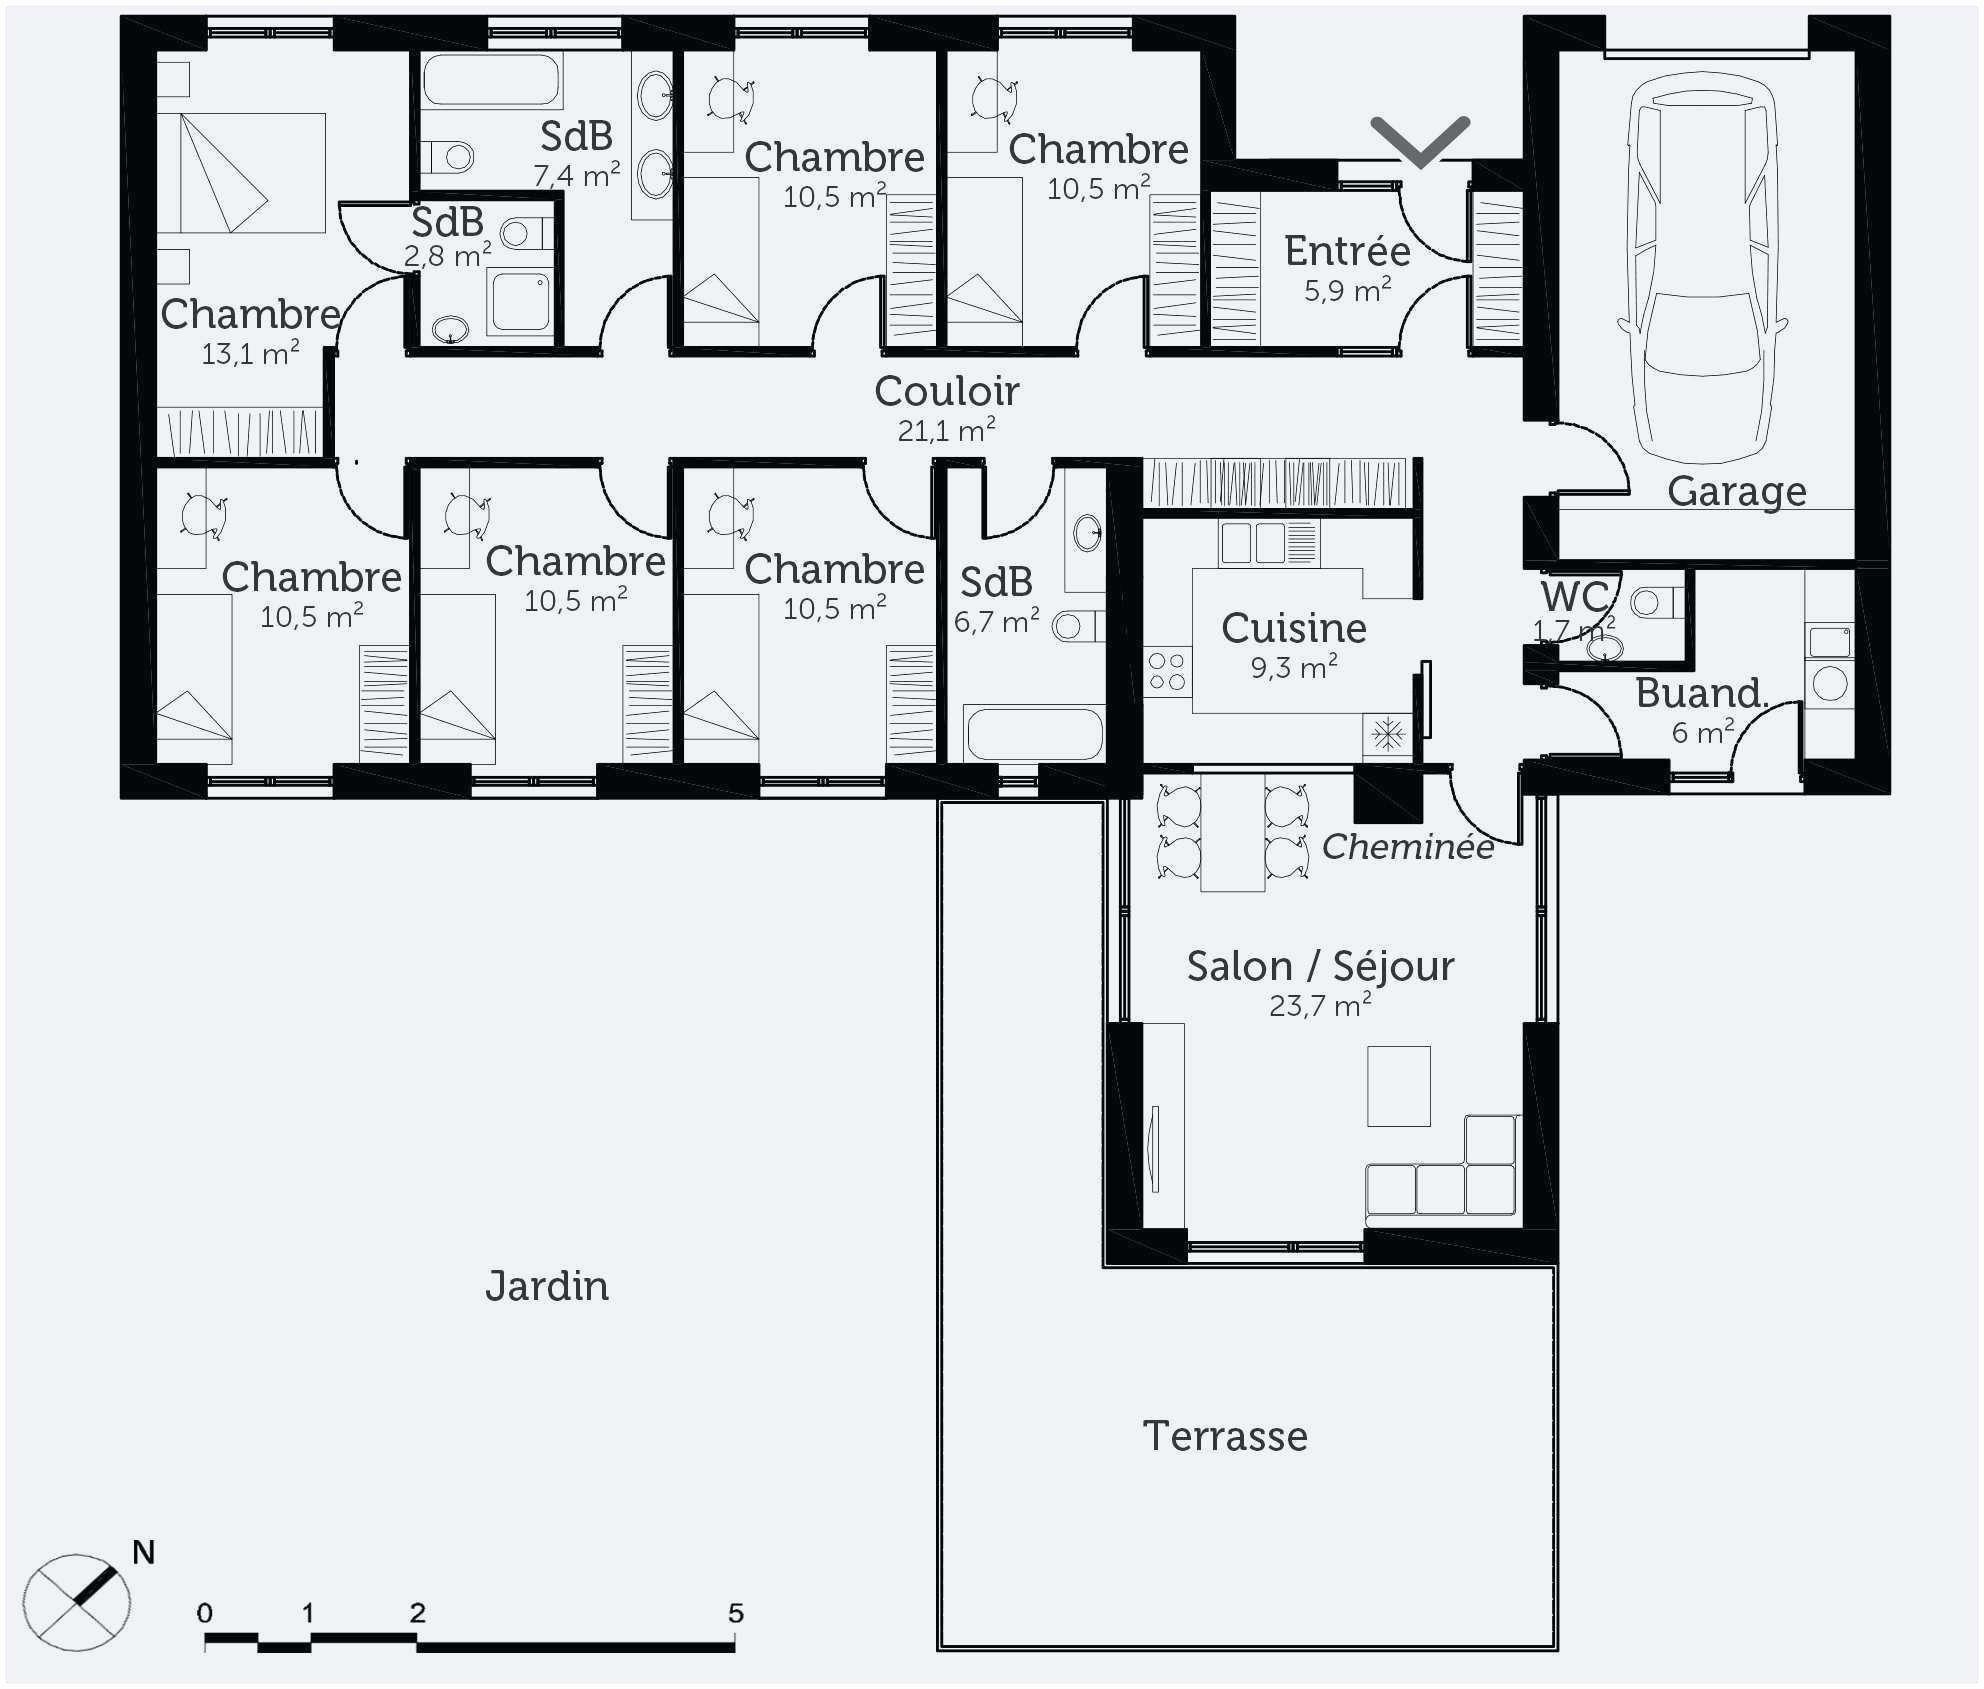 36 Plan Maison Plain Pied 3 Chambres 100m2 | How to plan, Floor plans, Interior design bedroom